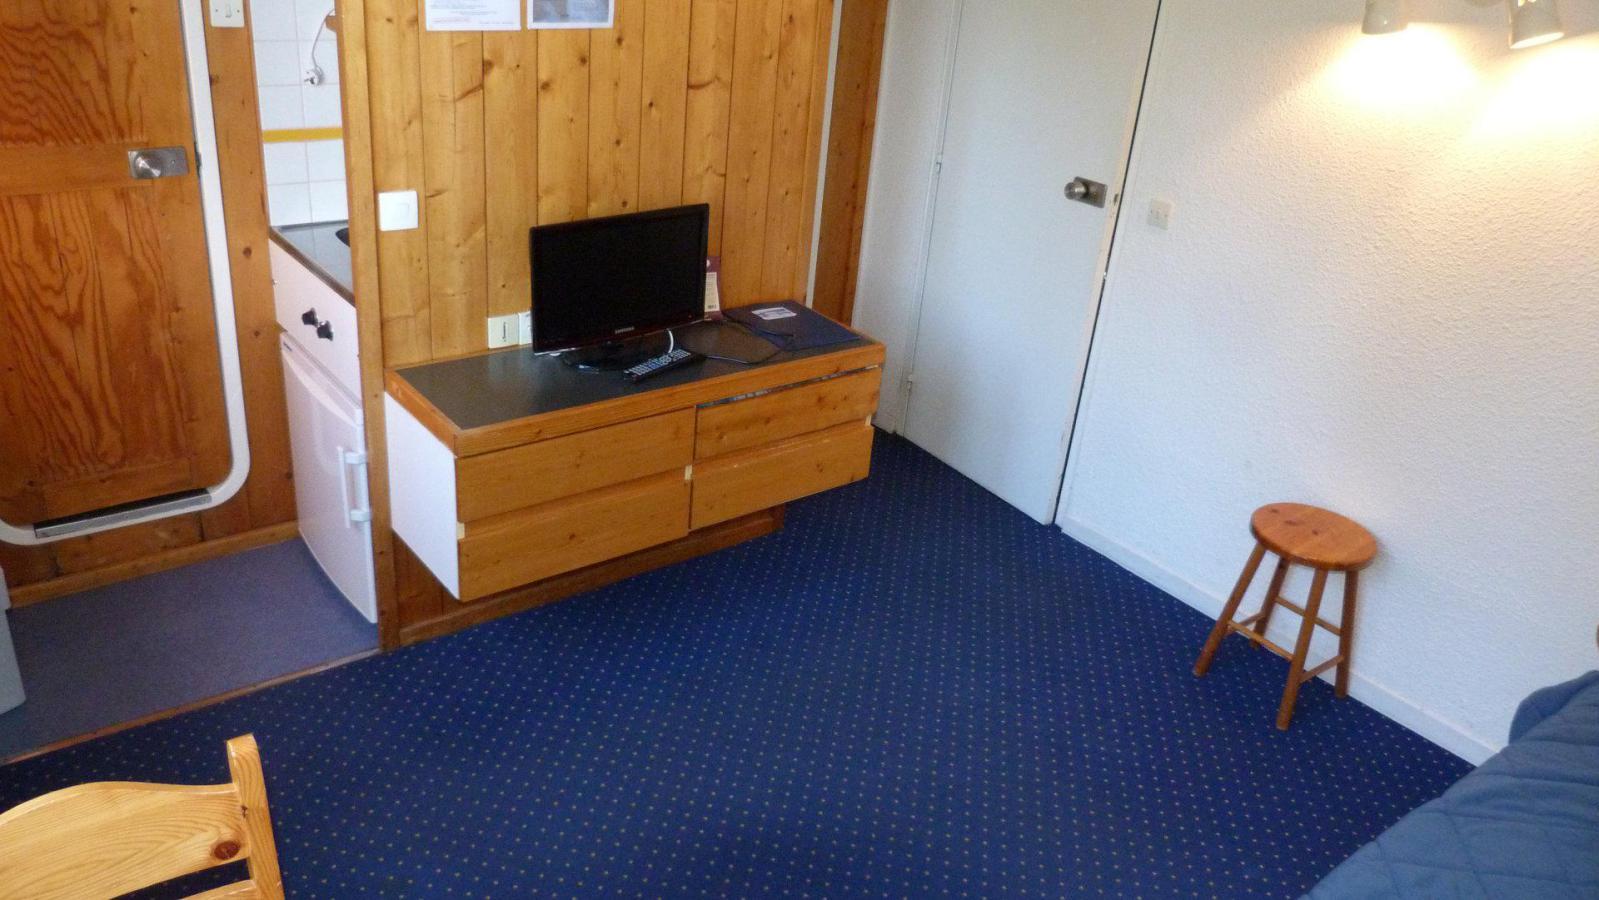 Location au ski Studio 2 personnes (1133) - Residence Nova - Les Arcs